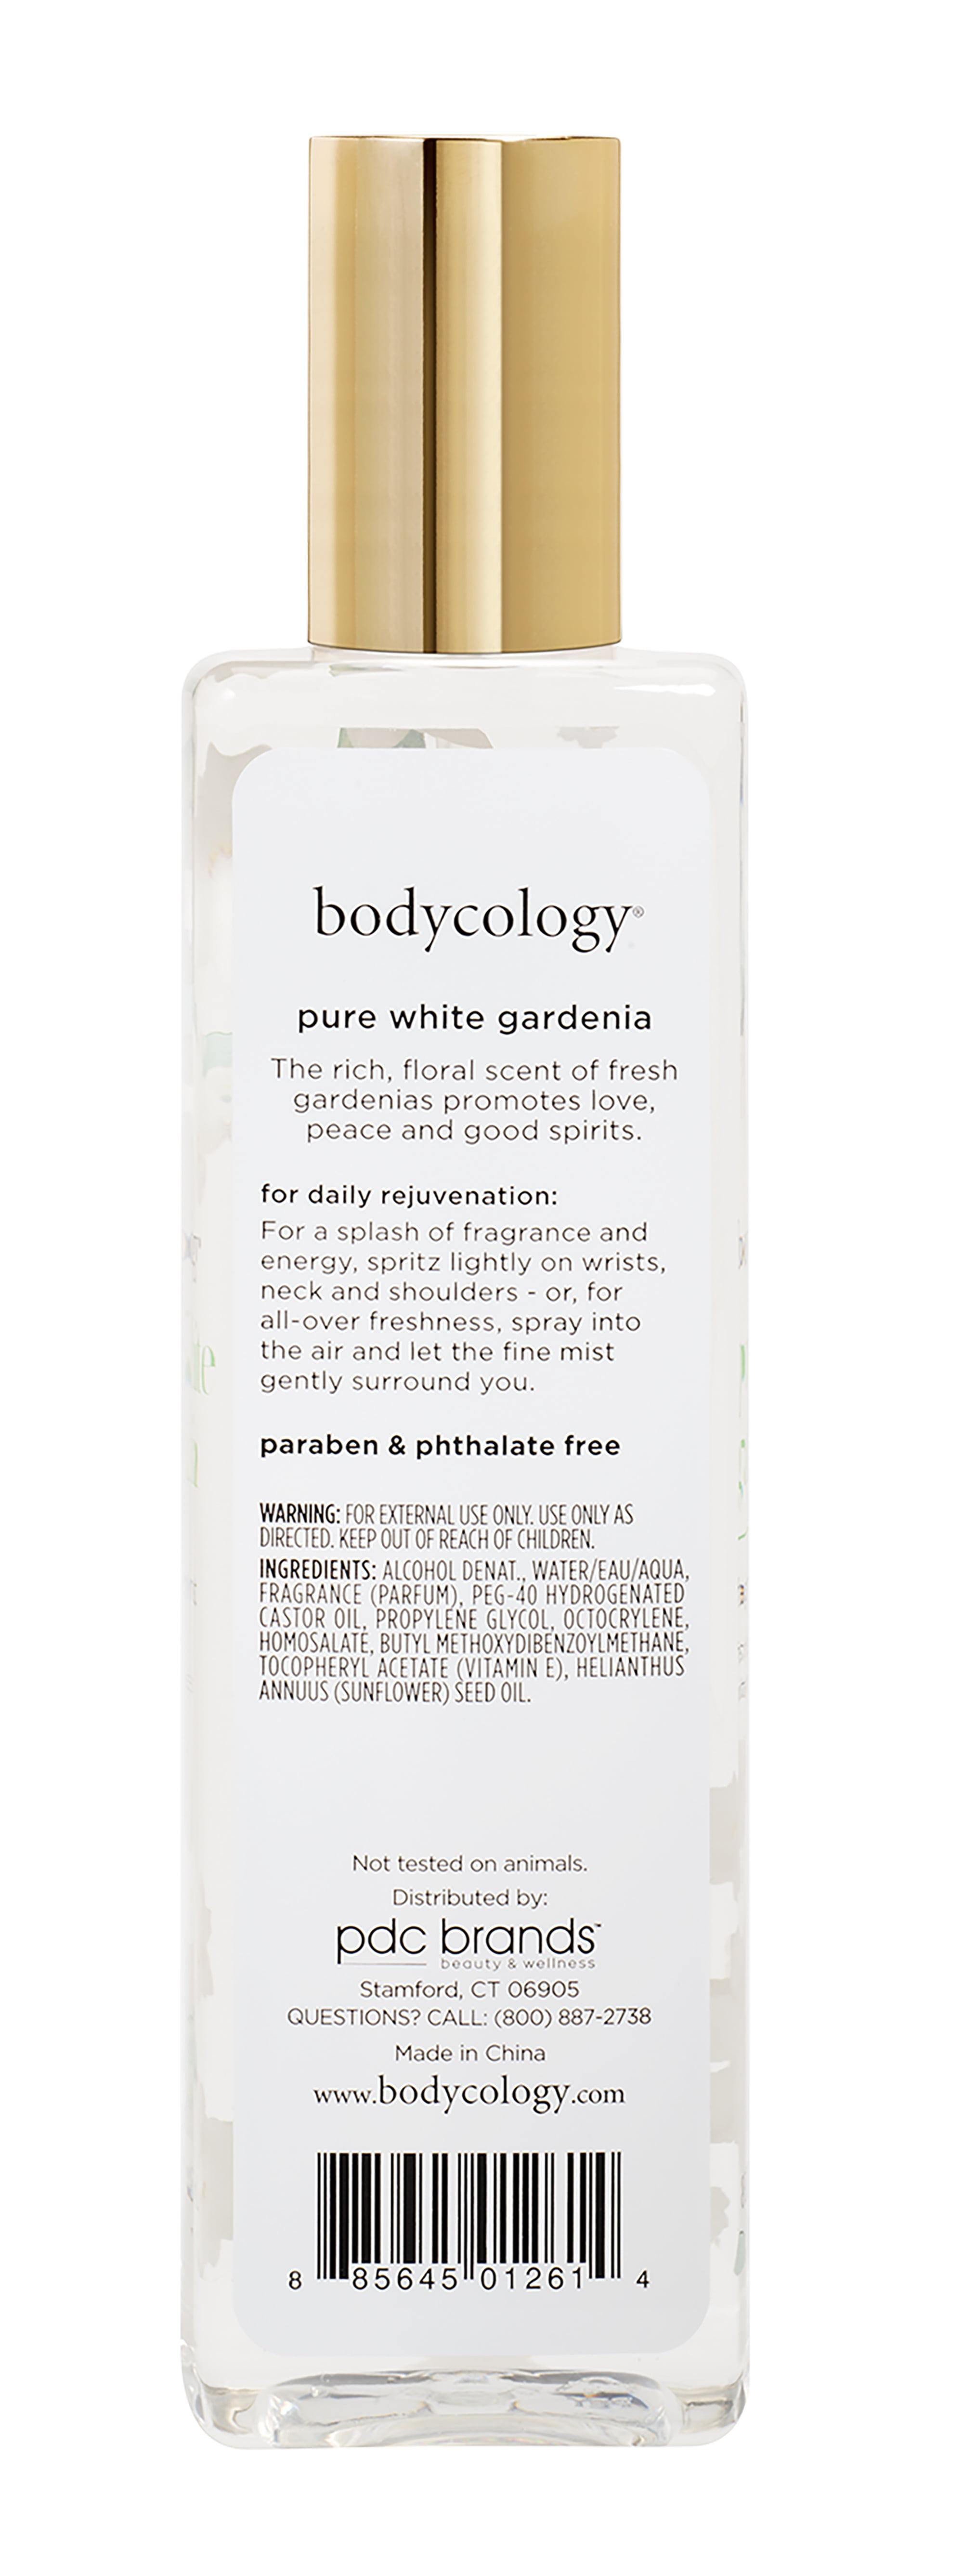 Bodycology Bodycology Pure White Gardenia Fragrance Mist Spray for Women 8  oz